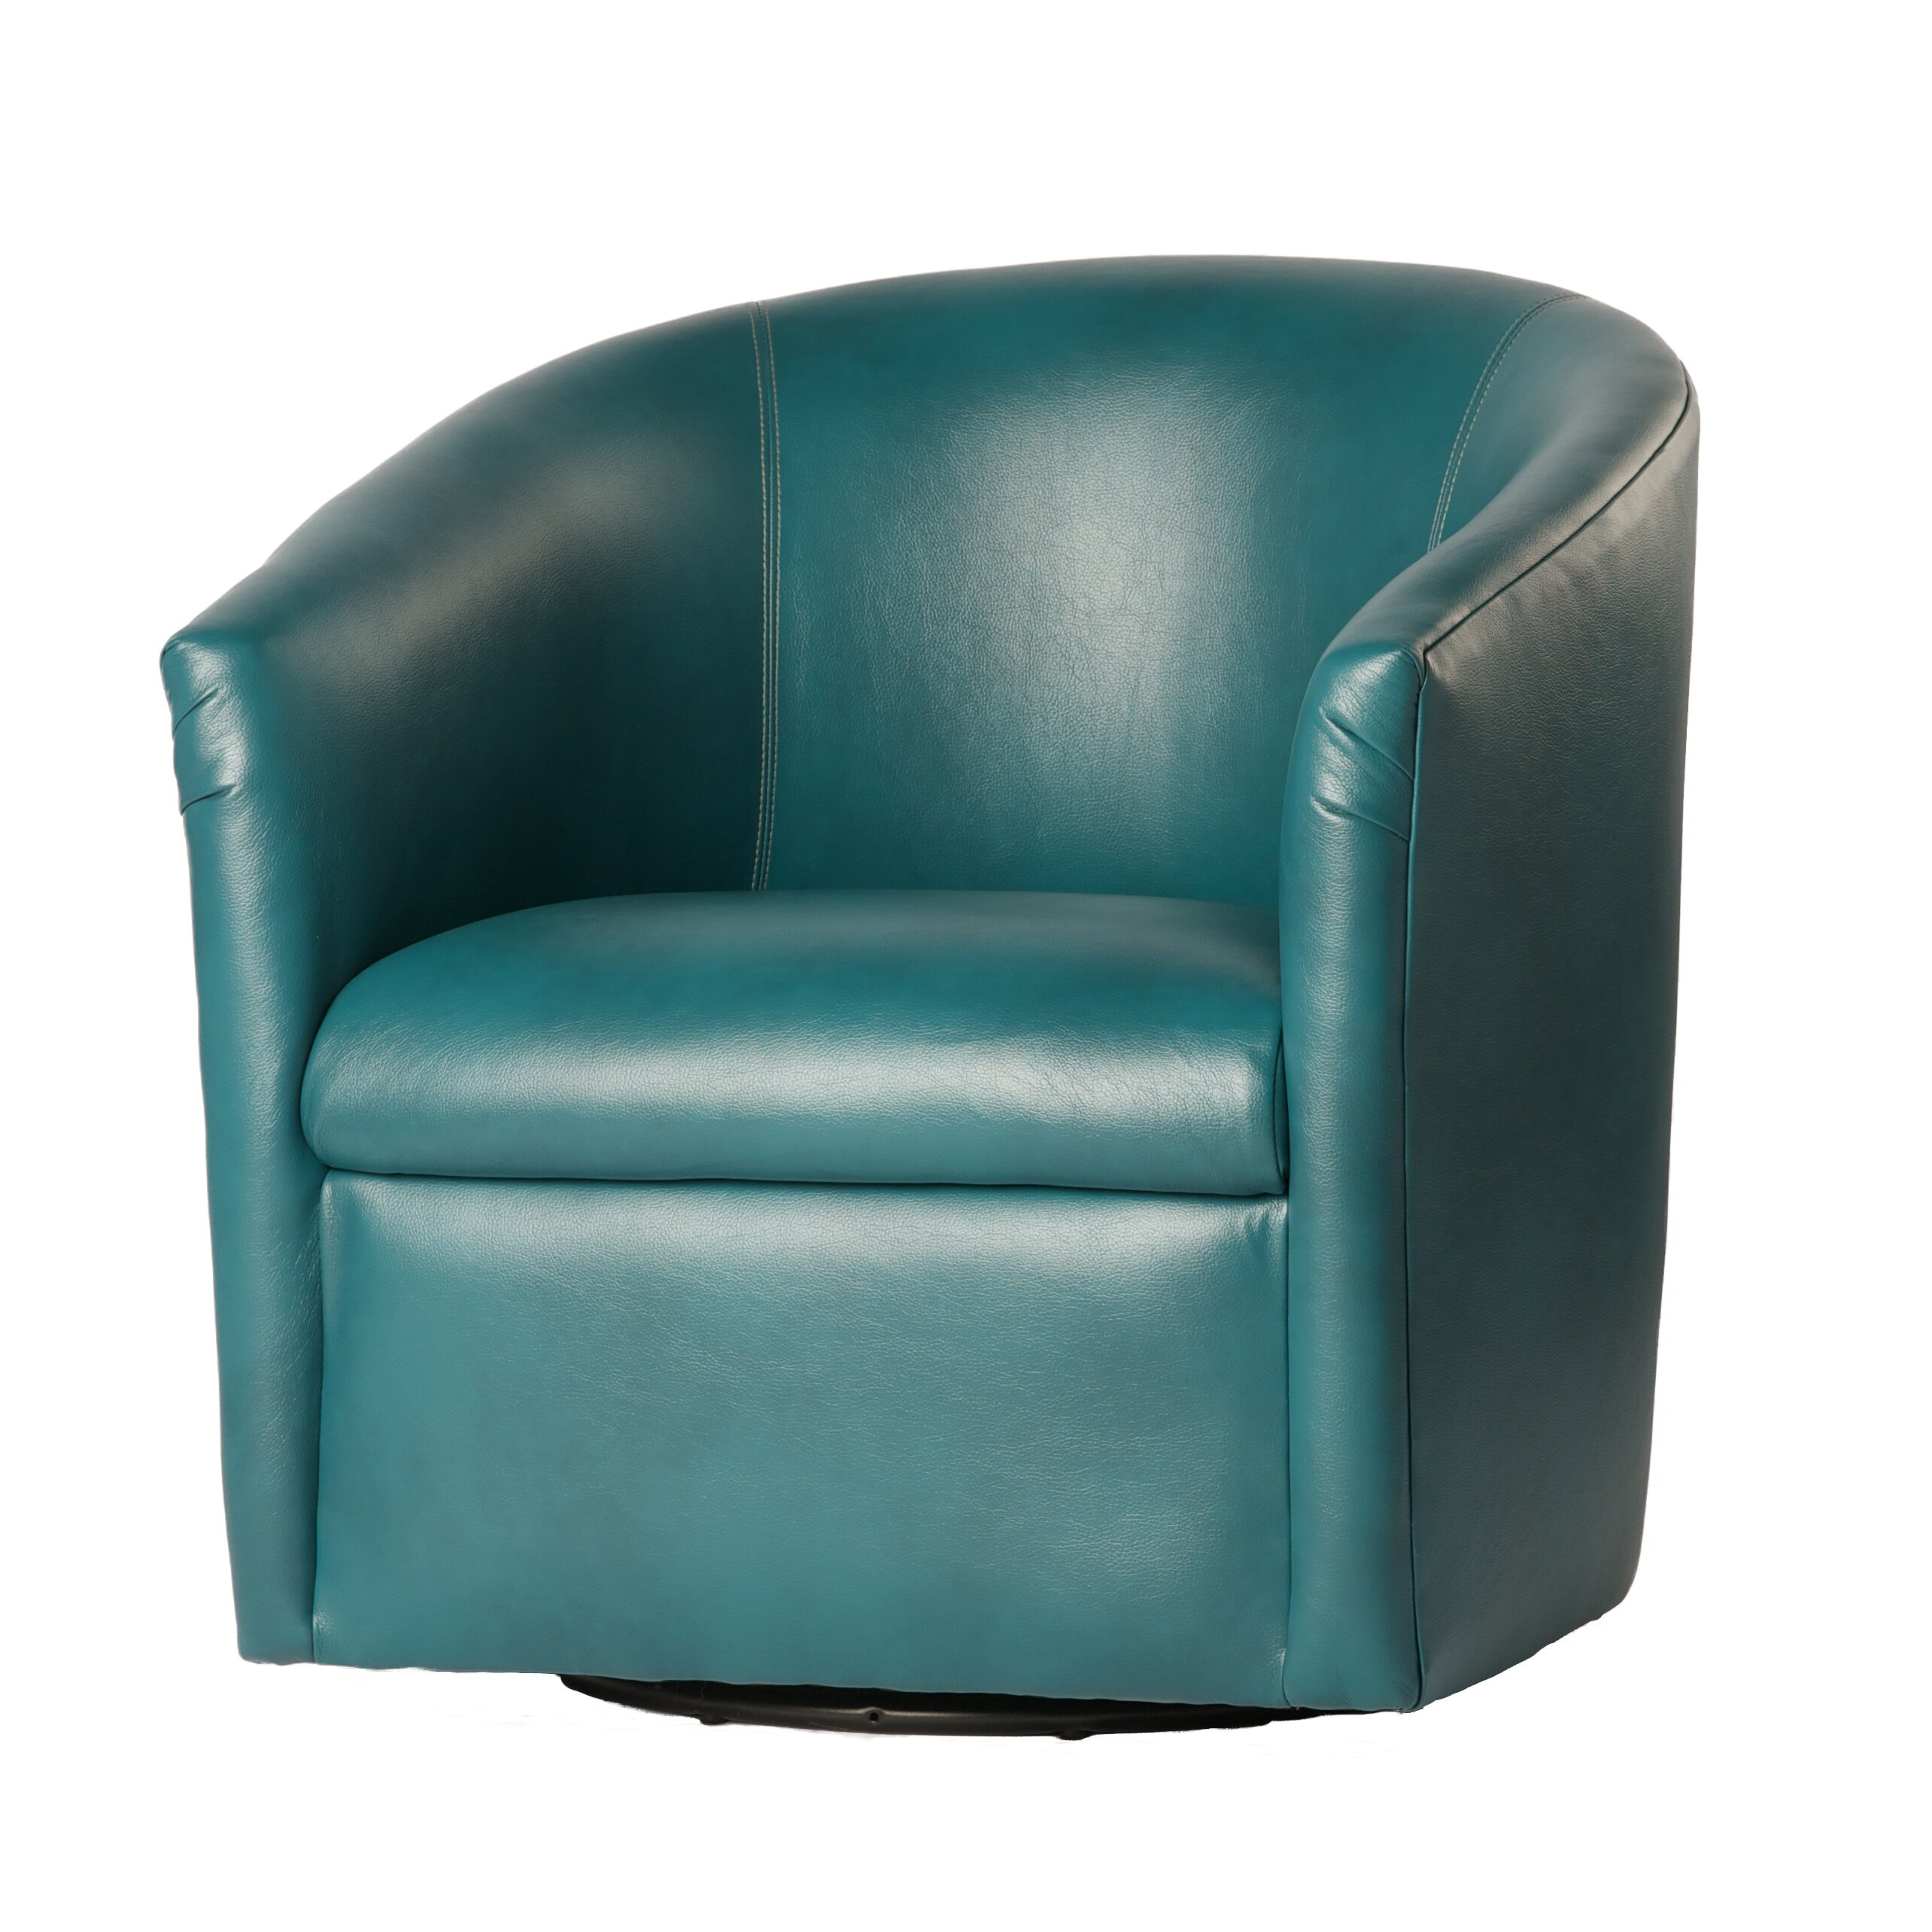 fort Pointe Draper Swivel Barrel Chair & Reviews